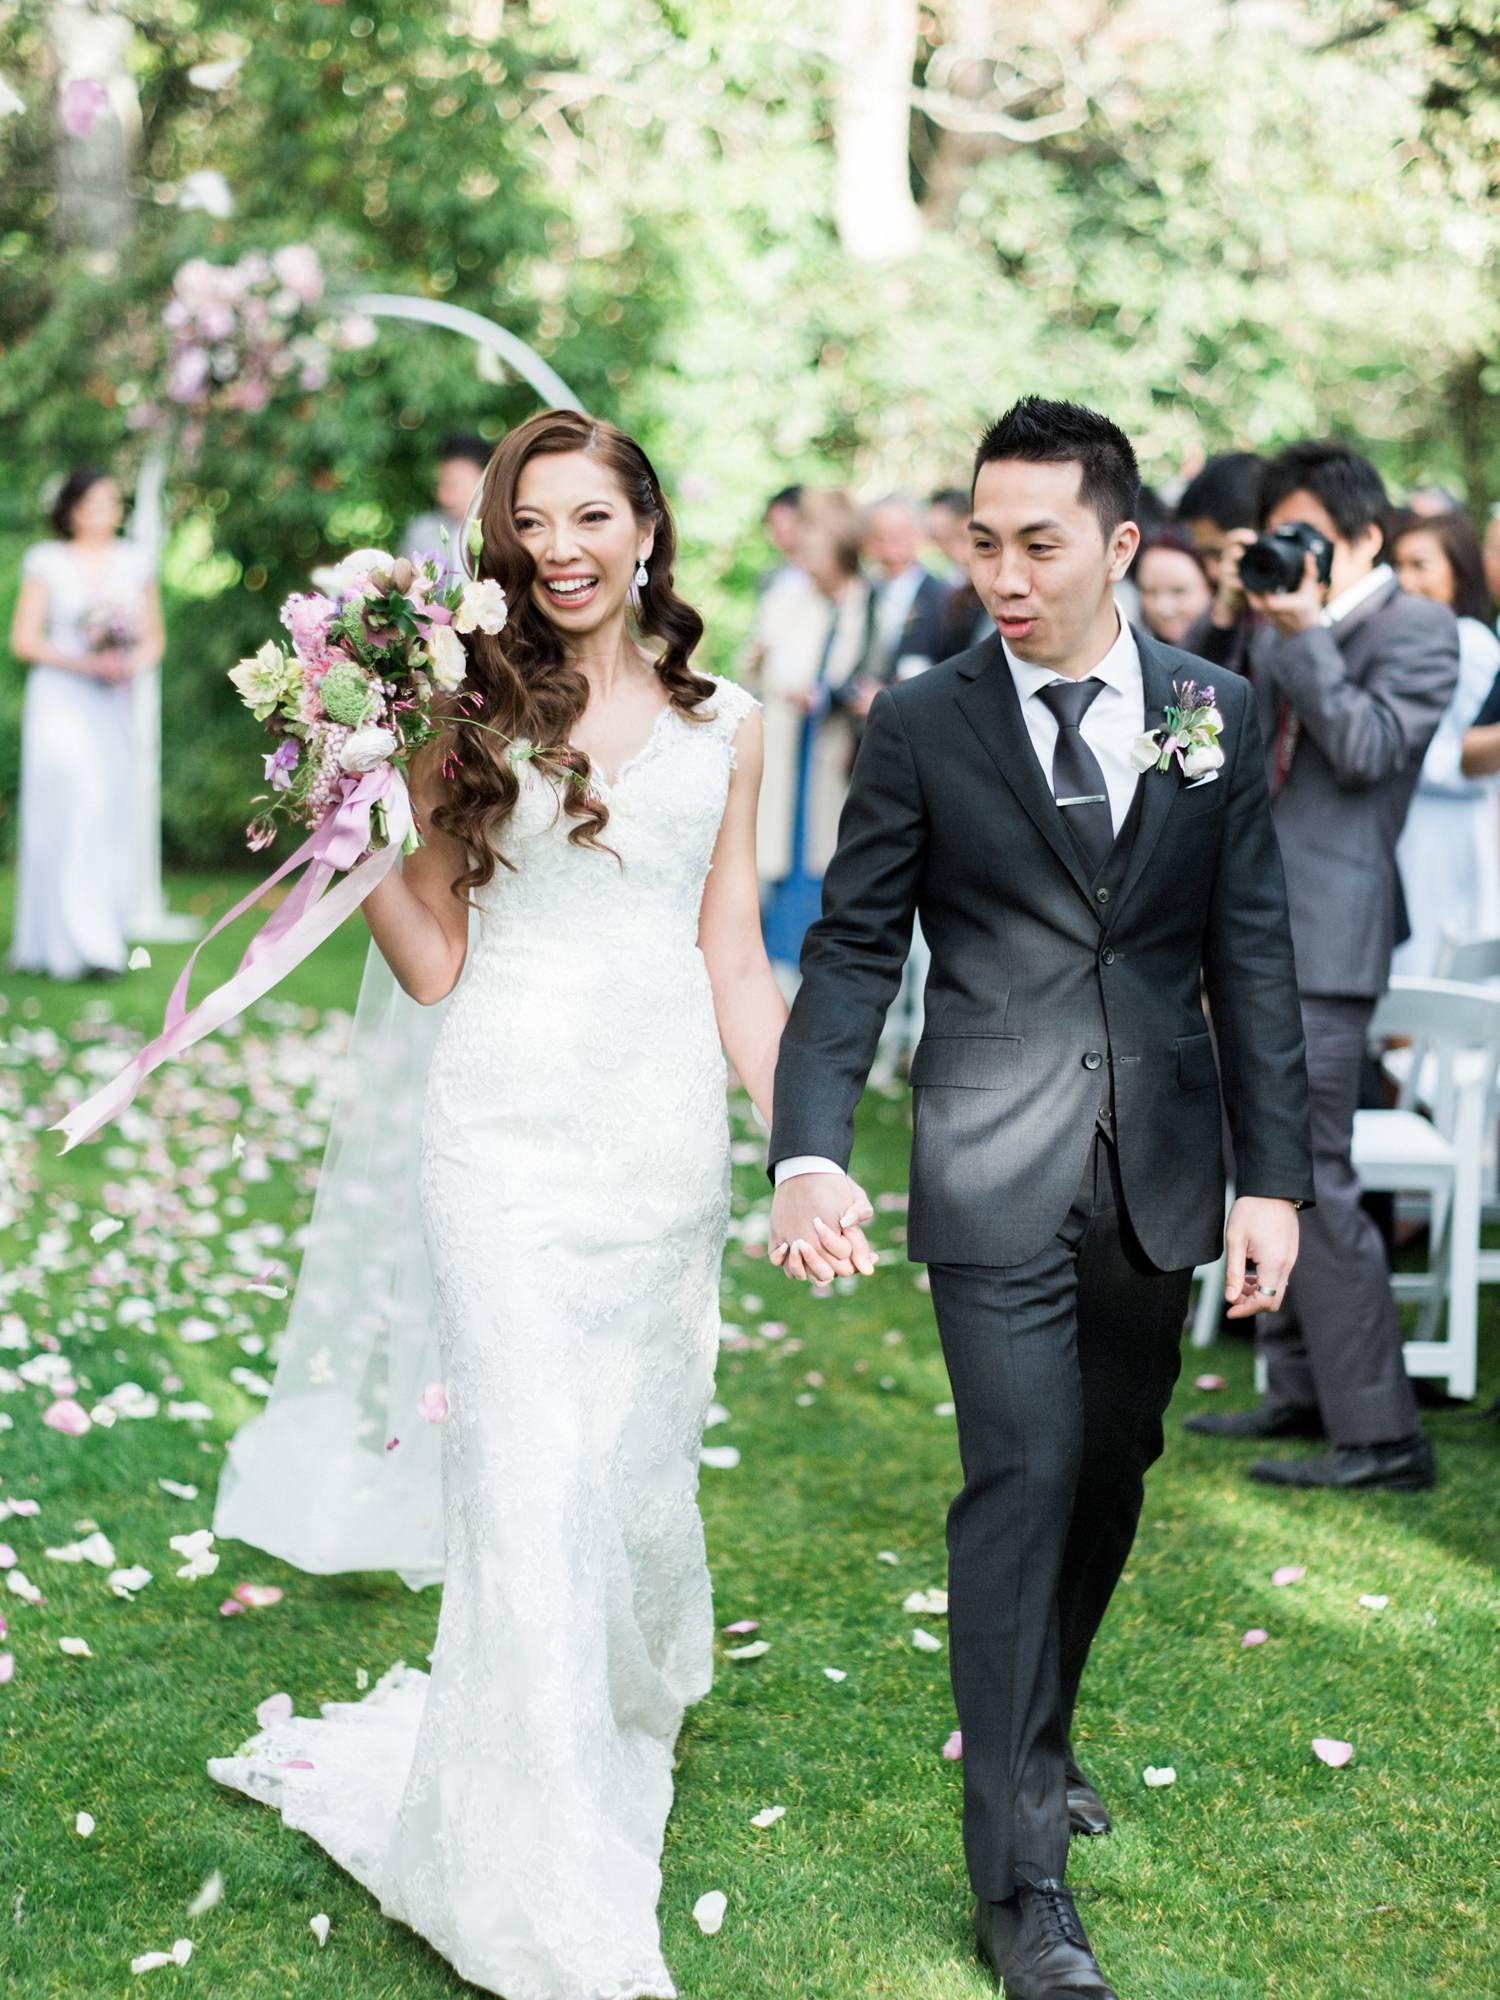 Somphors&dong-wedding-0478.jpg